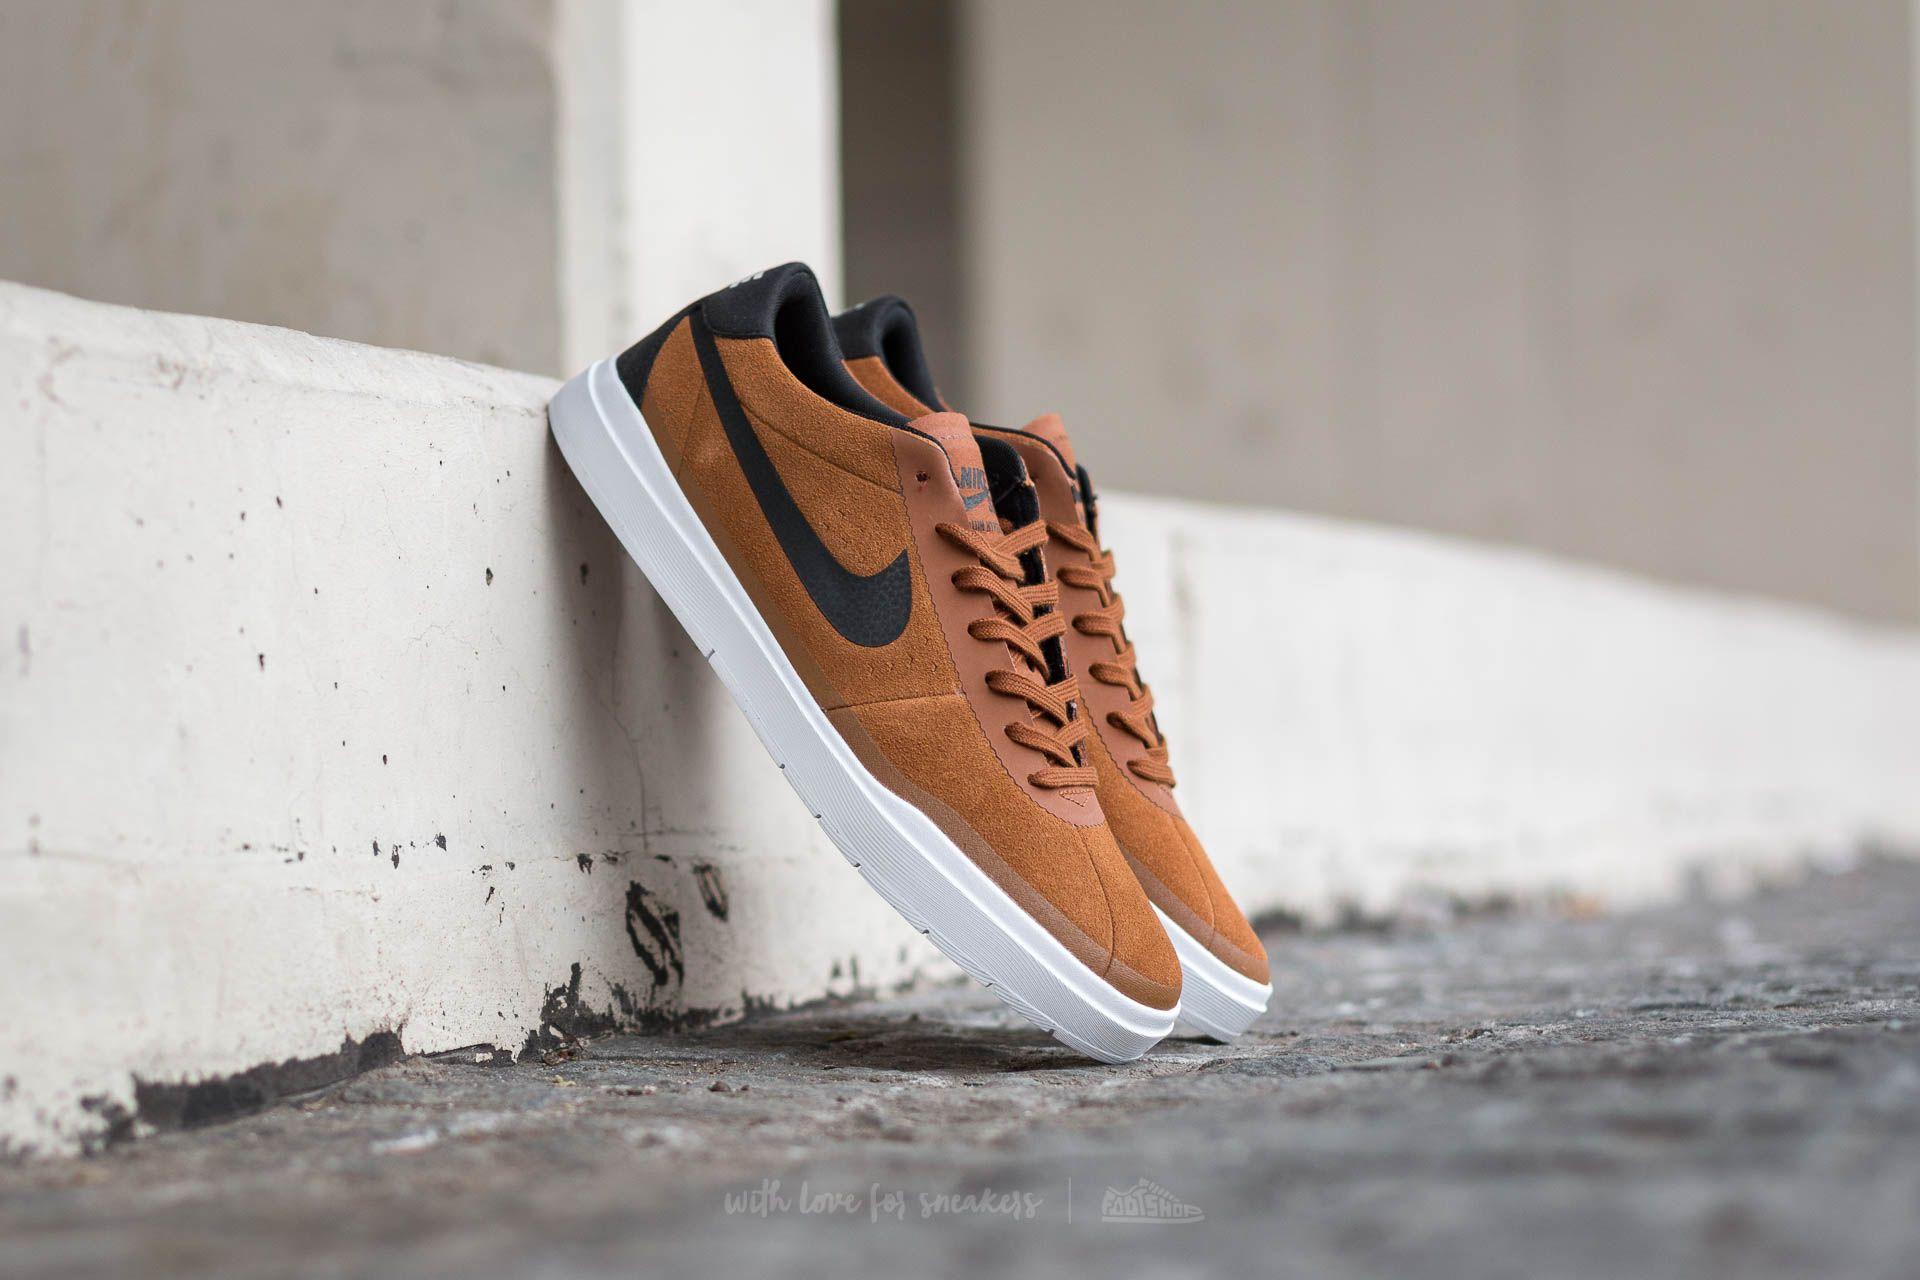 Nike Bruin SB Hyperfeel Hazelnut/ Black-White